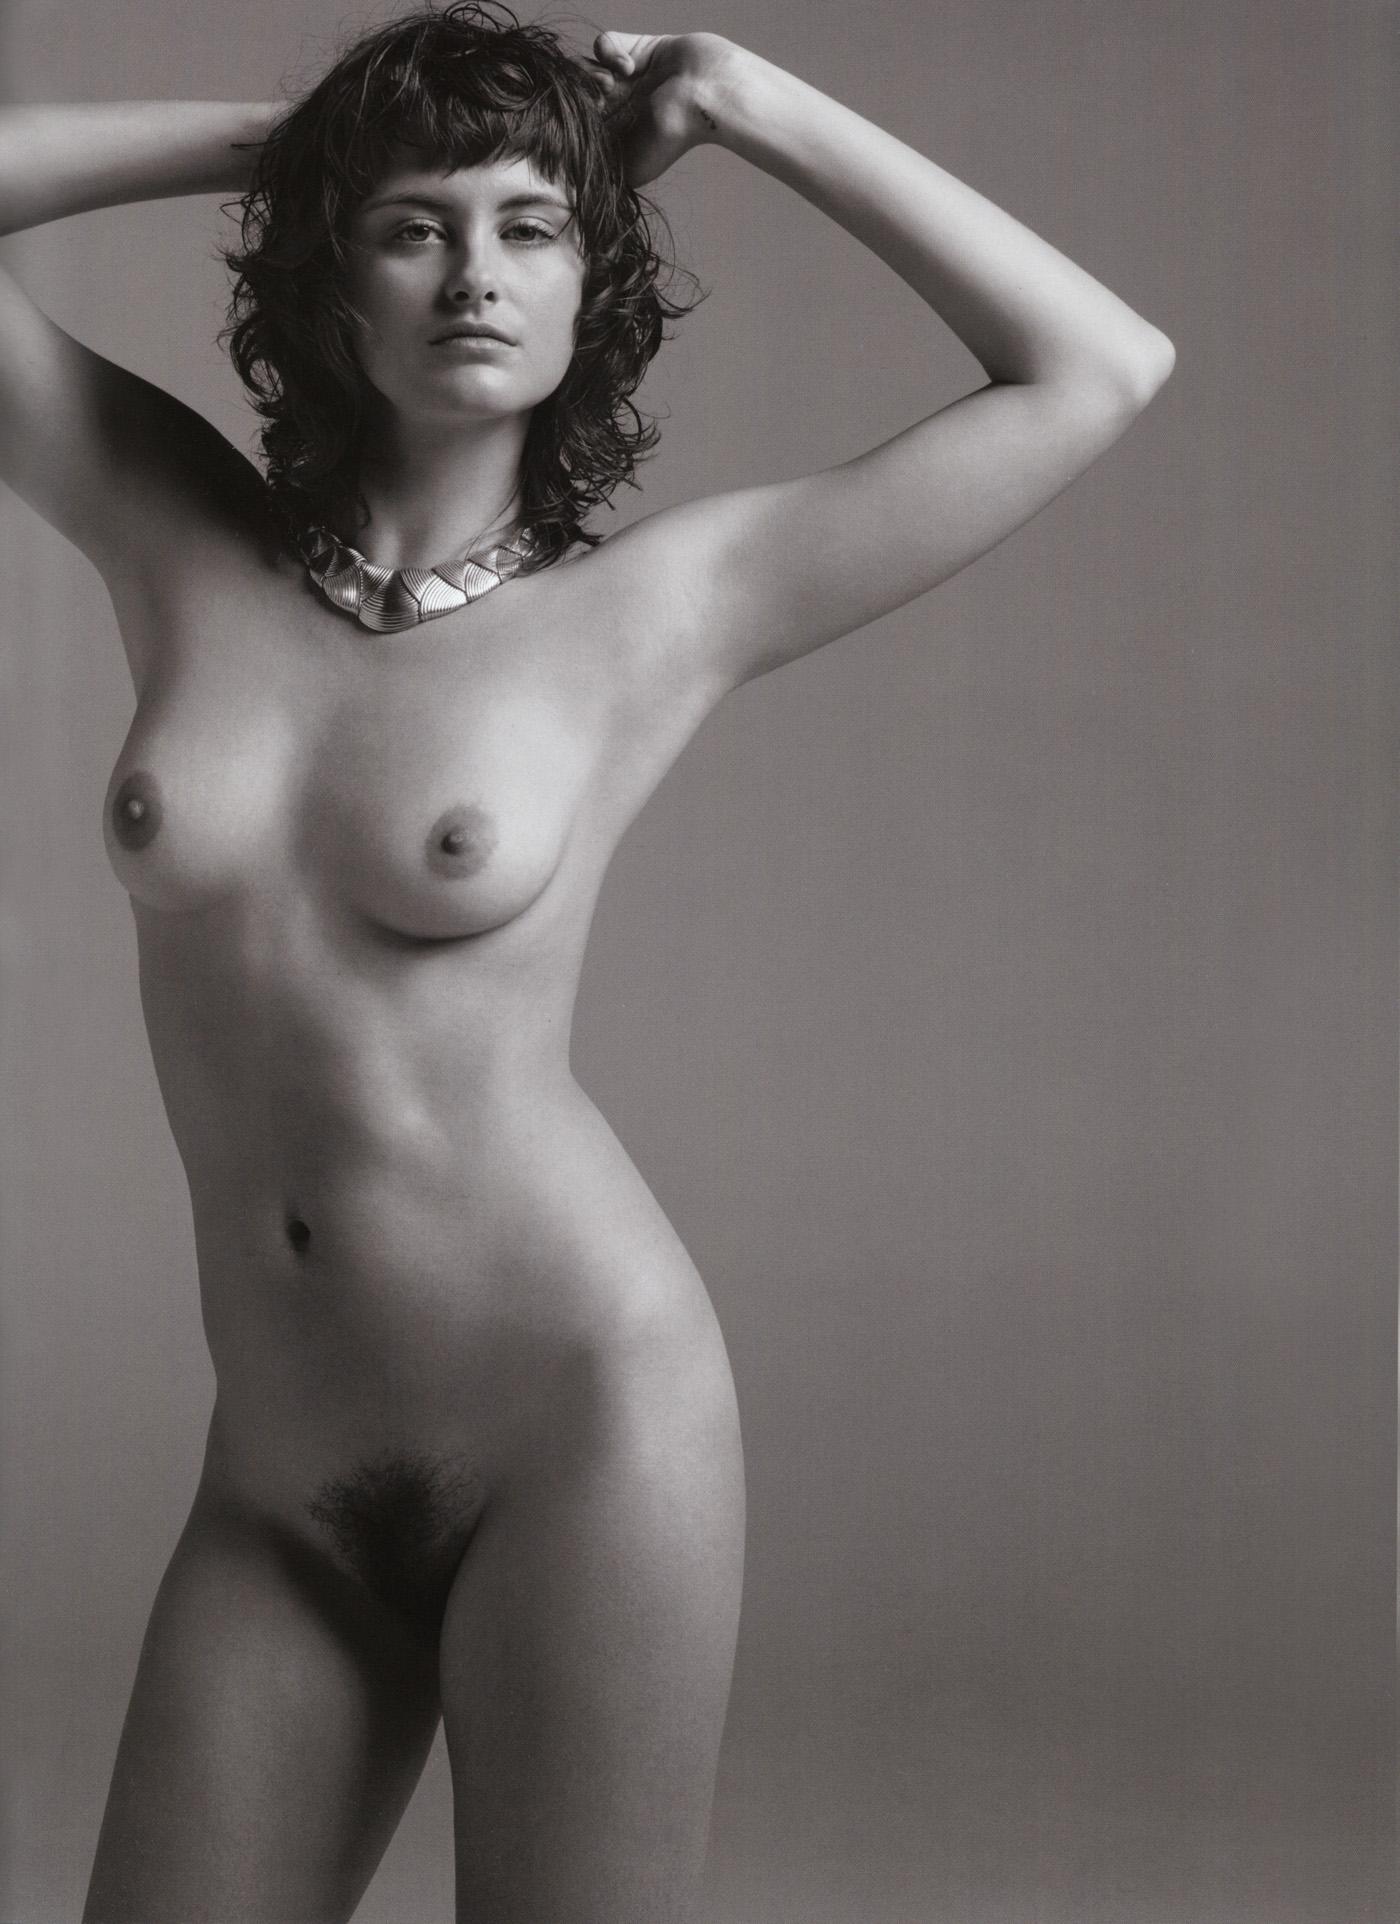 Trish Nude Pics